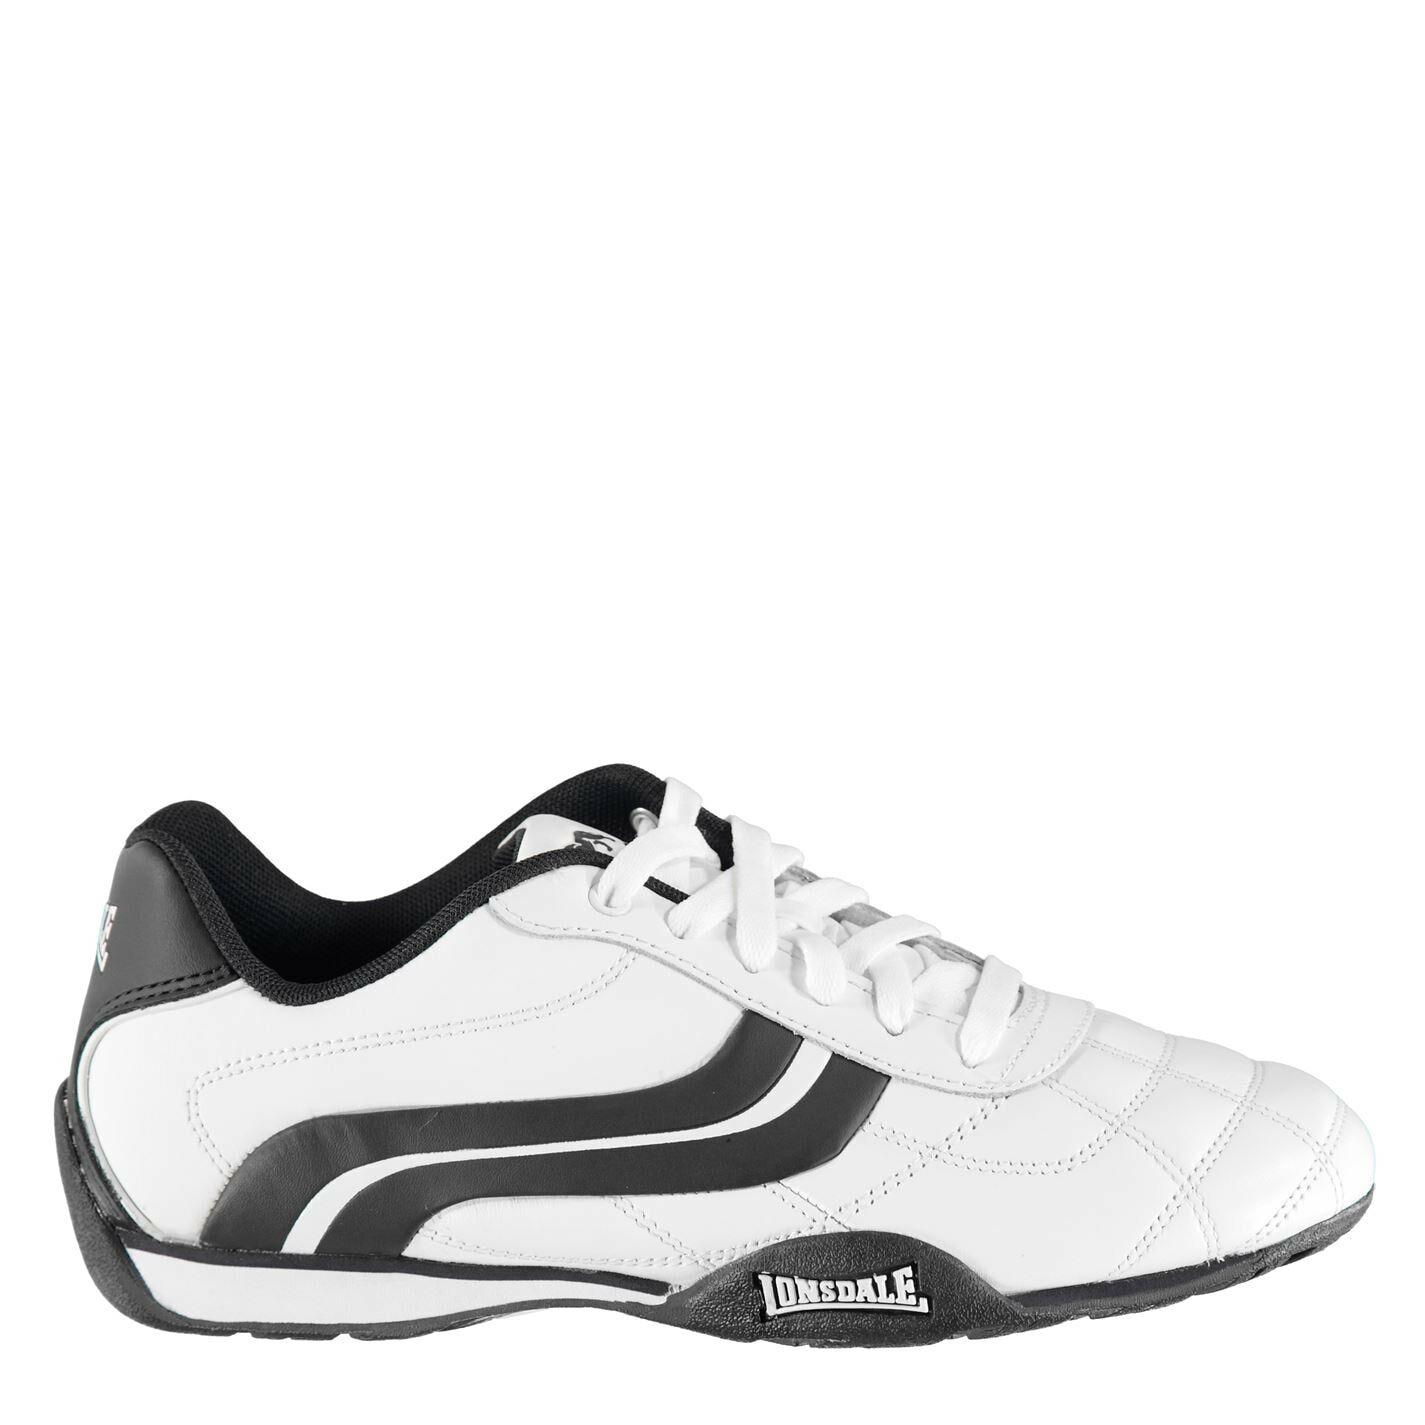 Lonsdale Camden αθλητικά παπούτσια για άνδρες (110054-11005437 ... 81b8007872e